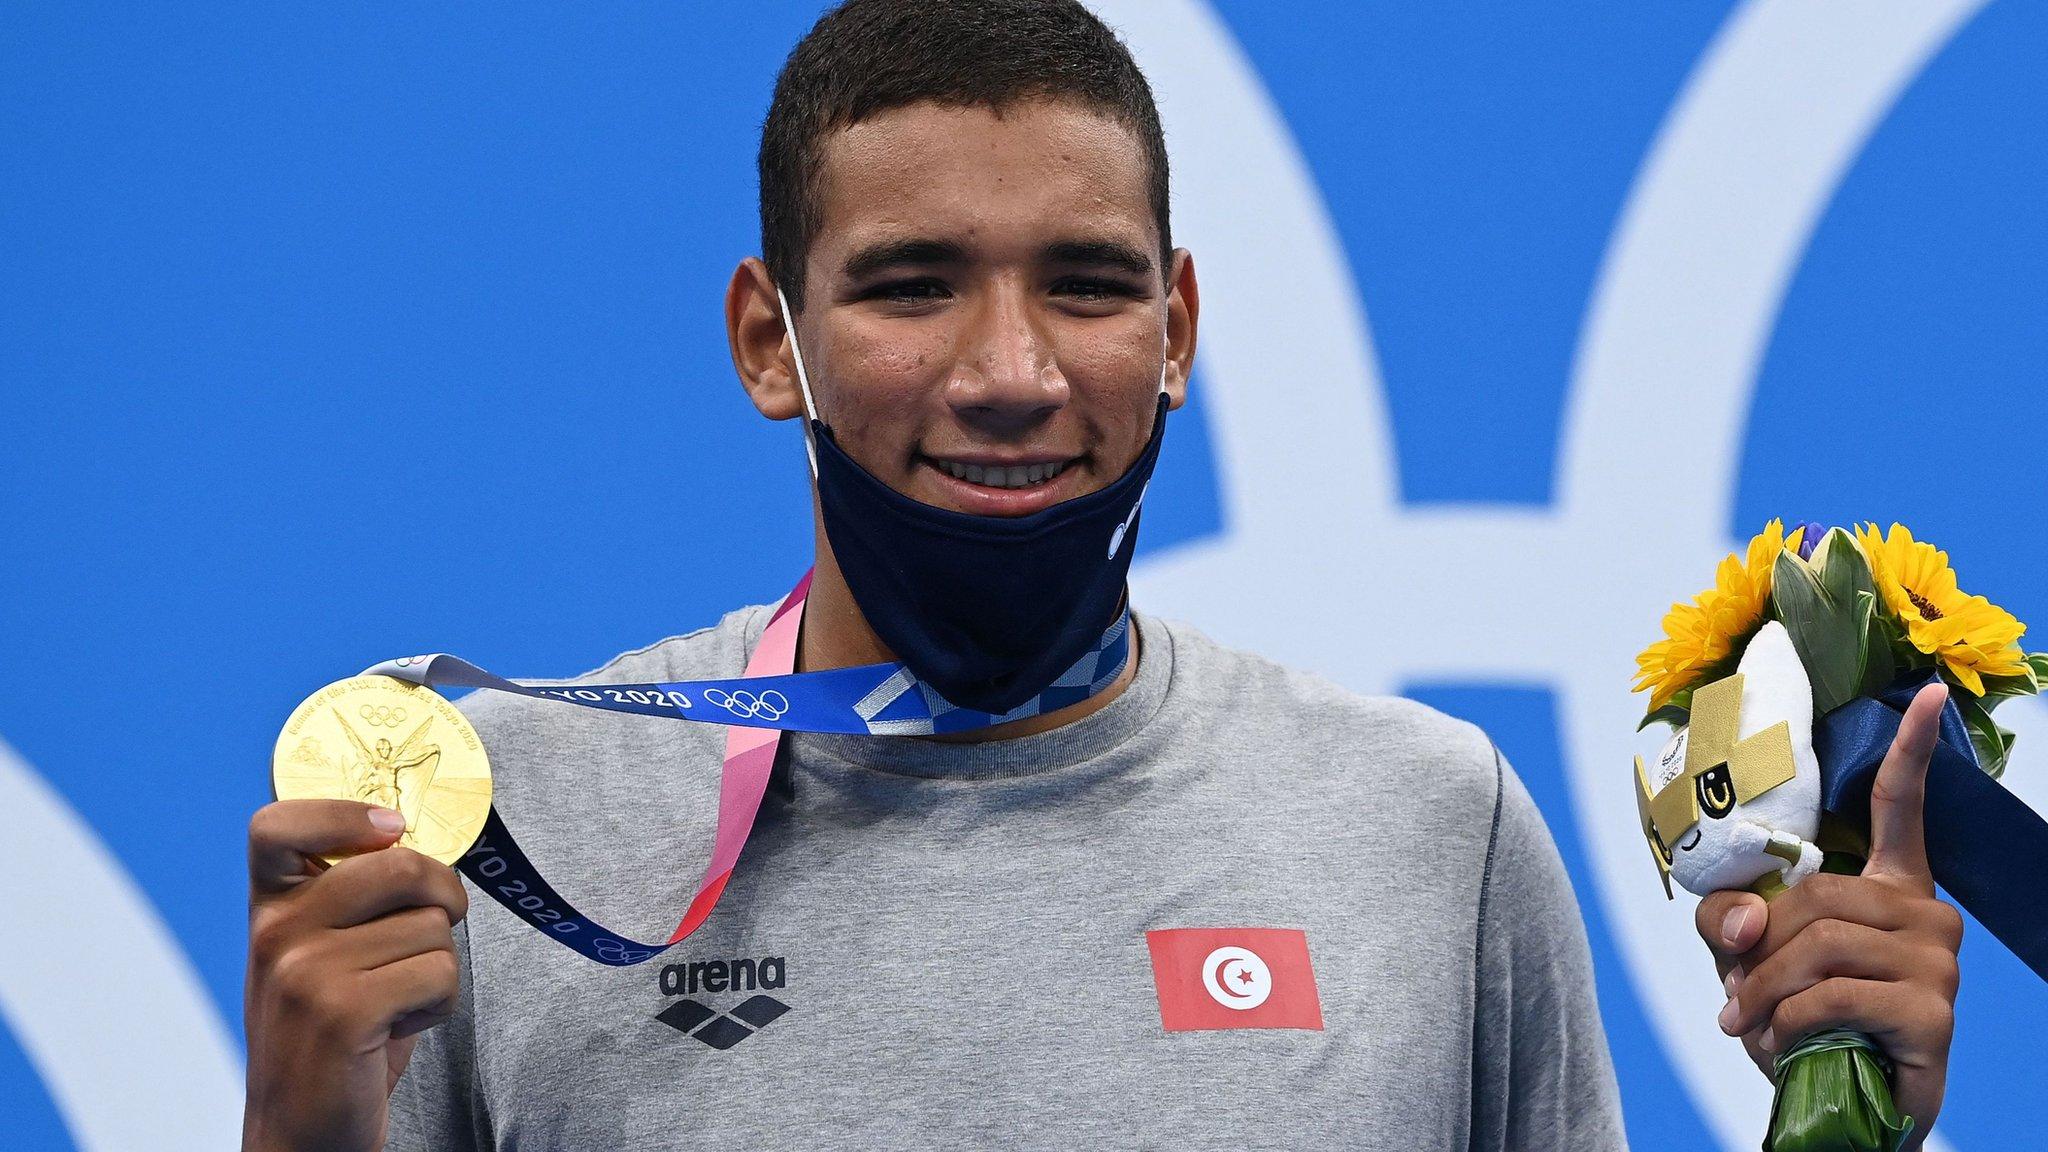 18-летний пловец, который удивил мир, взяв олимпийское золото